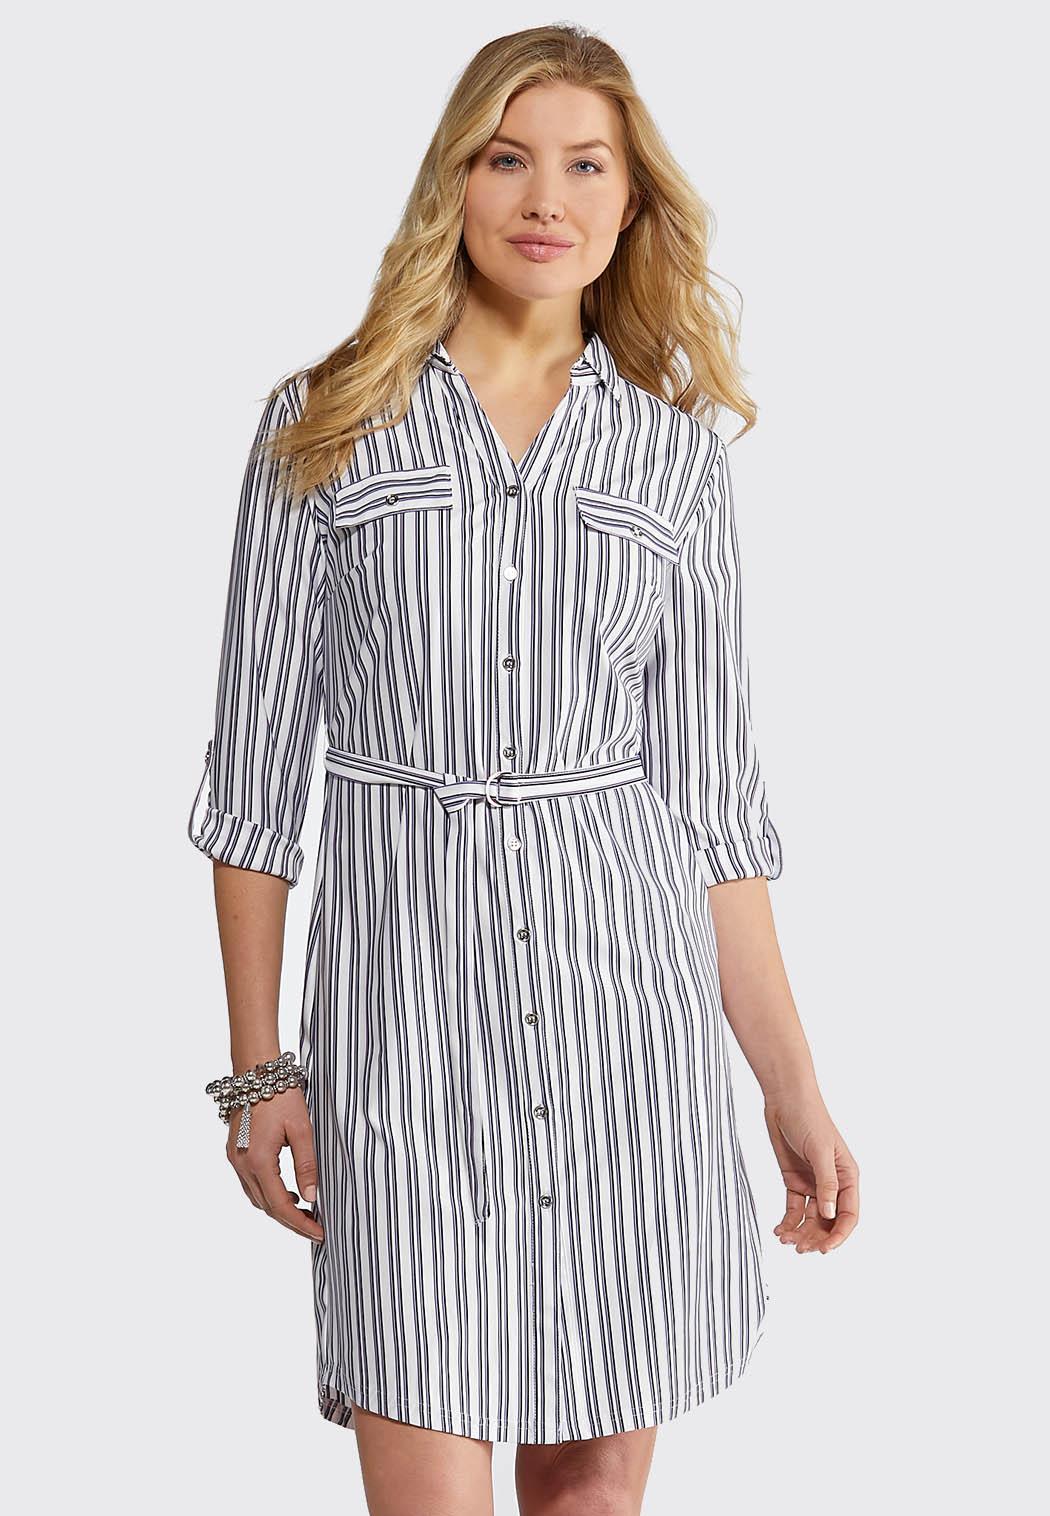 b96cde58f87 Triple Stripe Shirt Dress alternate view · Triple Stripe Shirt Dress